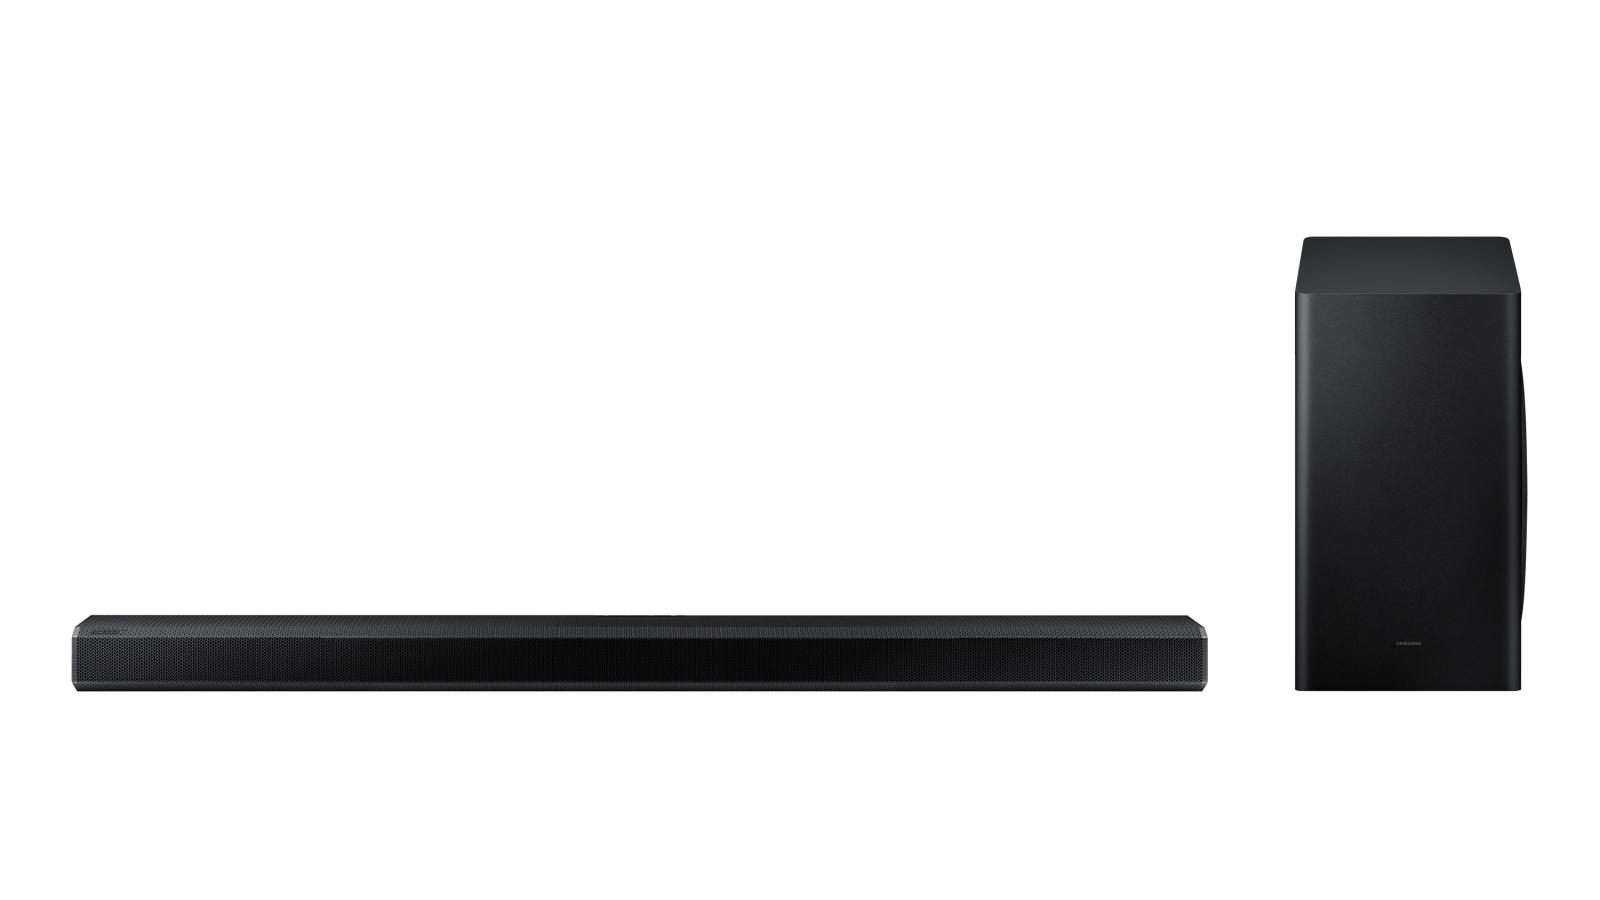 Image of Samsung Q700A 3.1.2 Channel Soundbar with Subwoofer